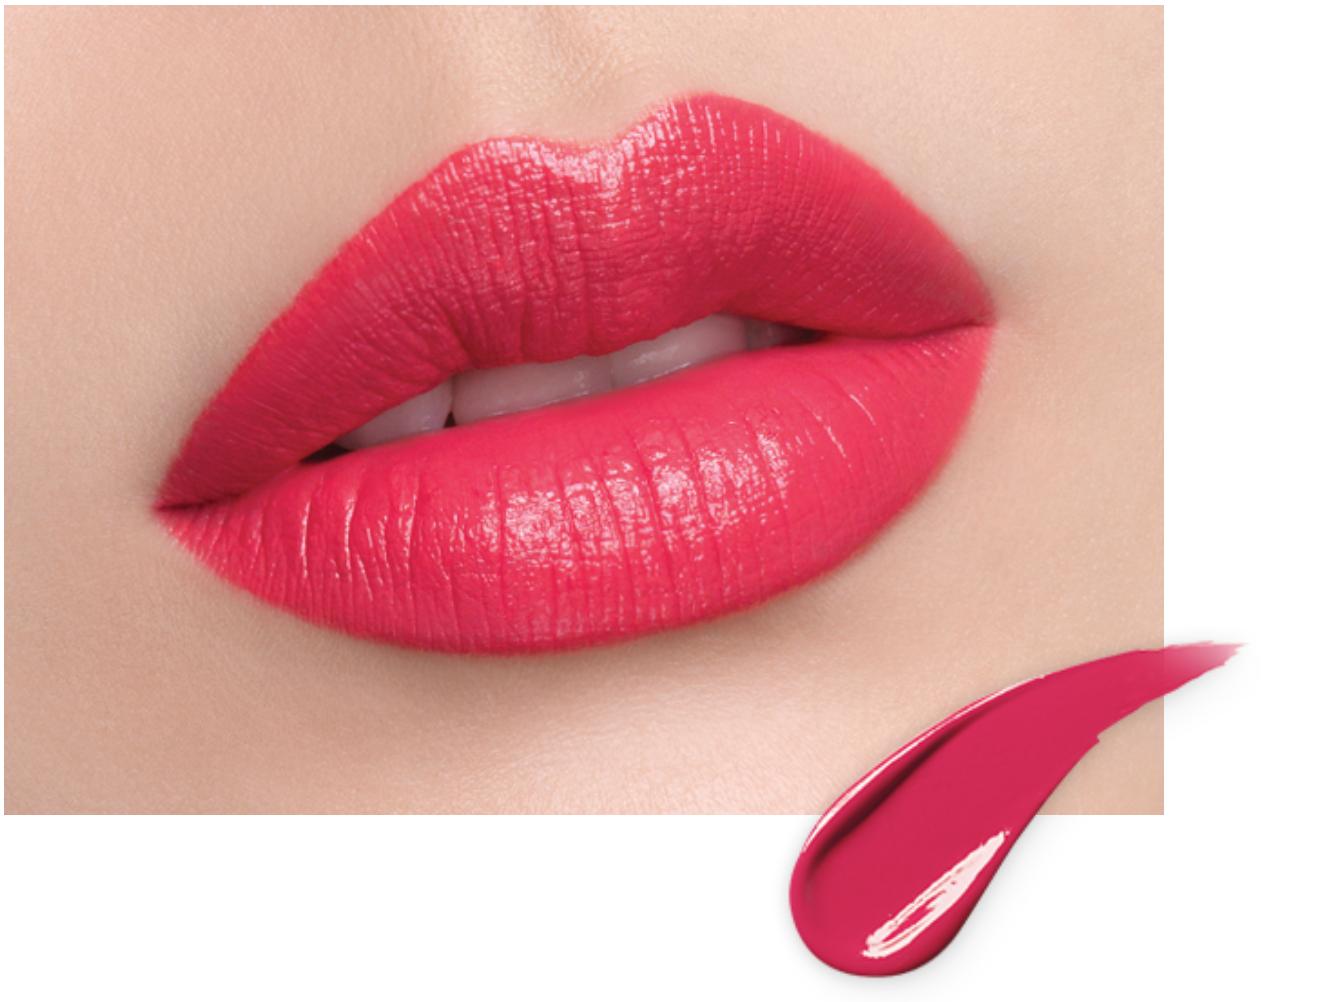 laneige-silk-intense-lipstick-147.png